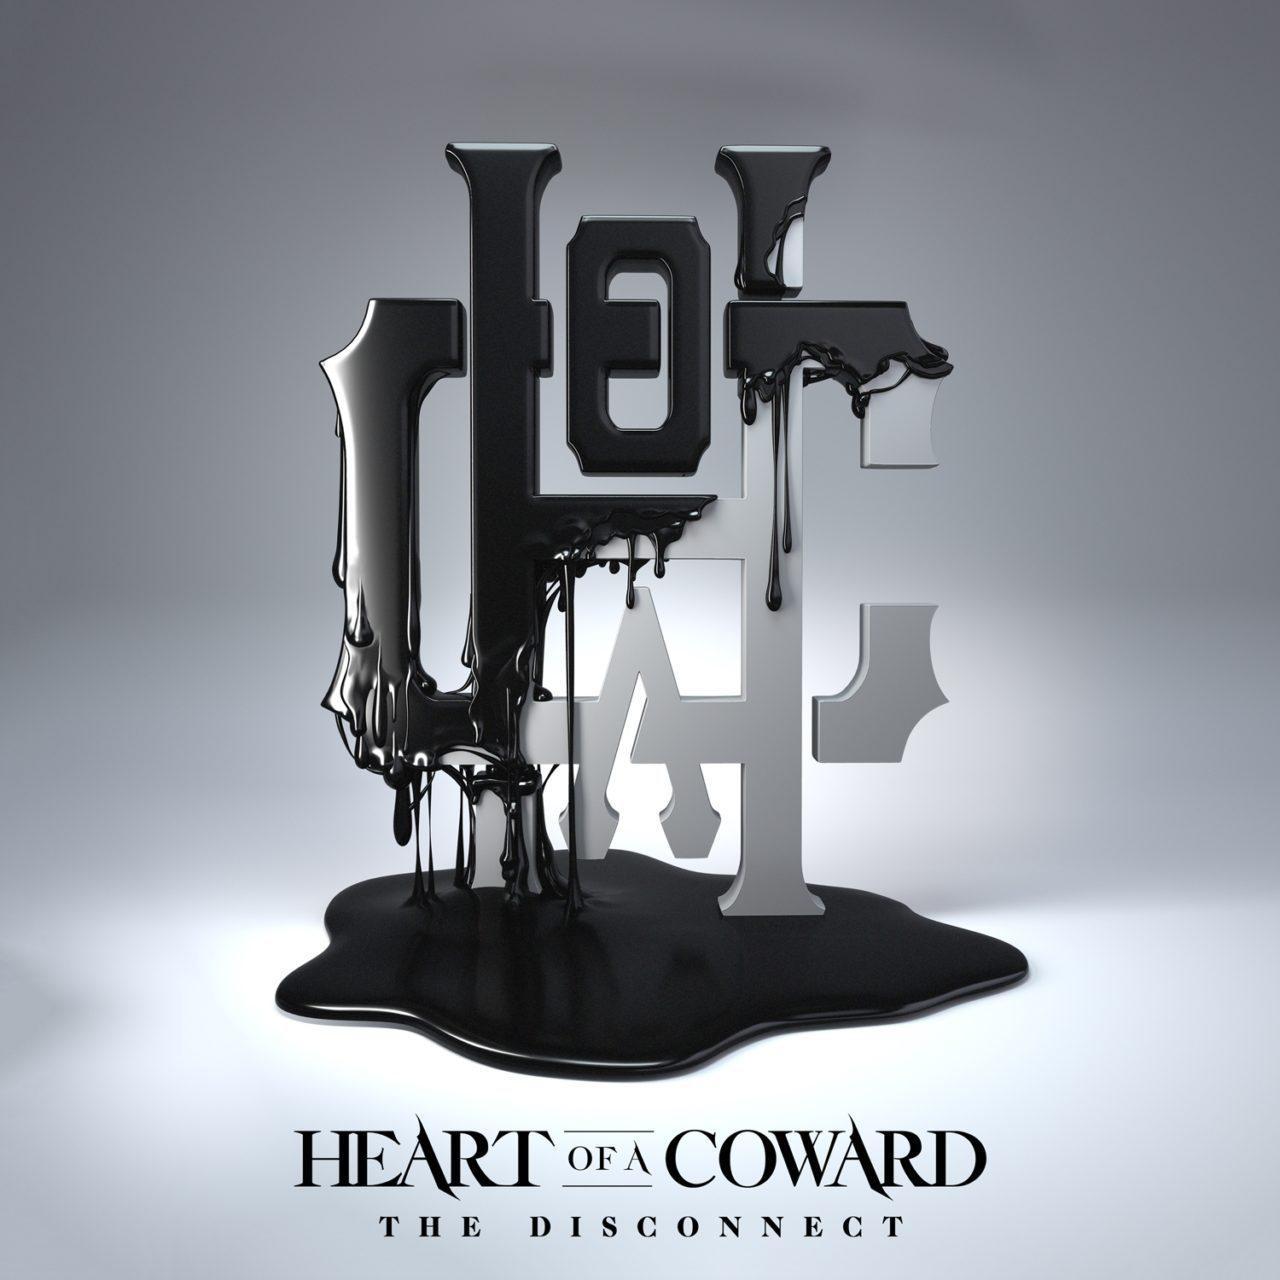 Heart Of A Coward -Artwork